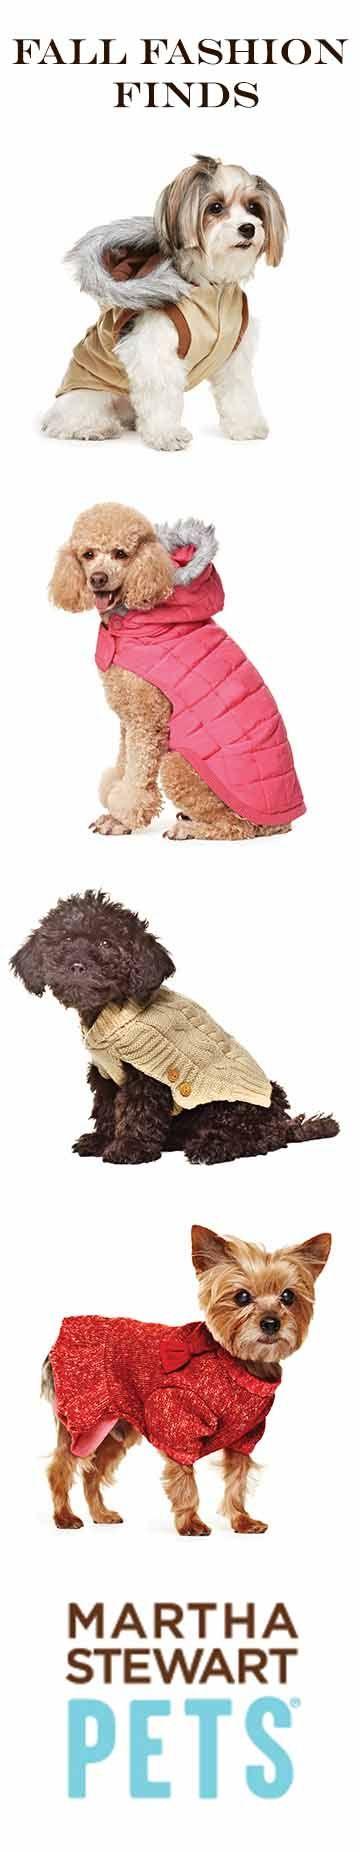 Fall fashion apparel from Martha Stewart Pets at PetSmart #Marthastewartpets #petsmart